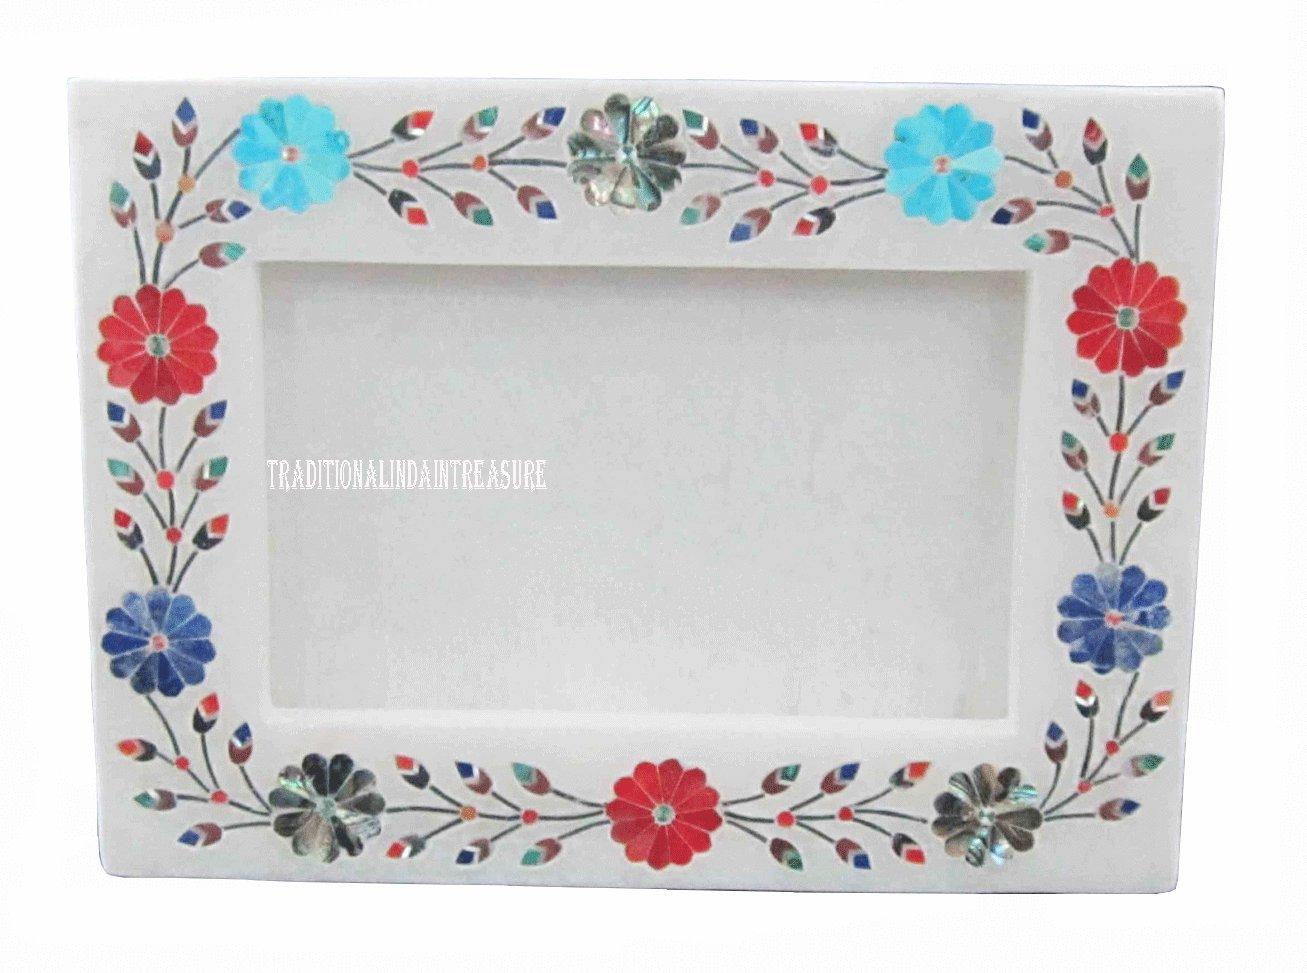 White Marble Photo Frame Semi Precious Stone Marquetry Inlay Mosaic Work Decor